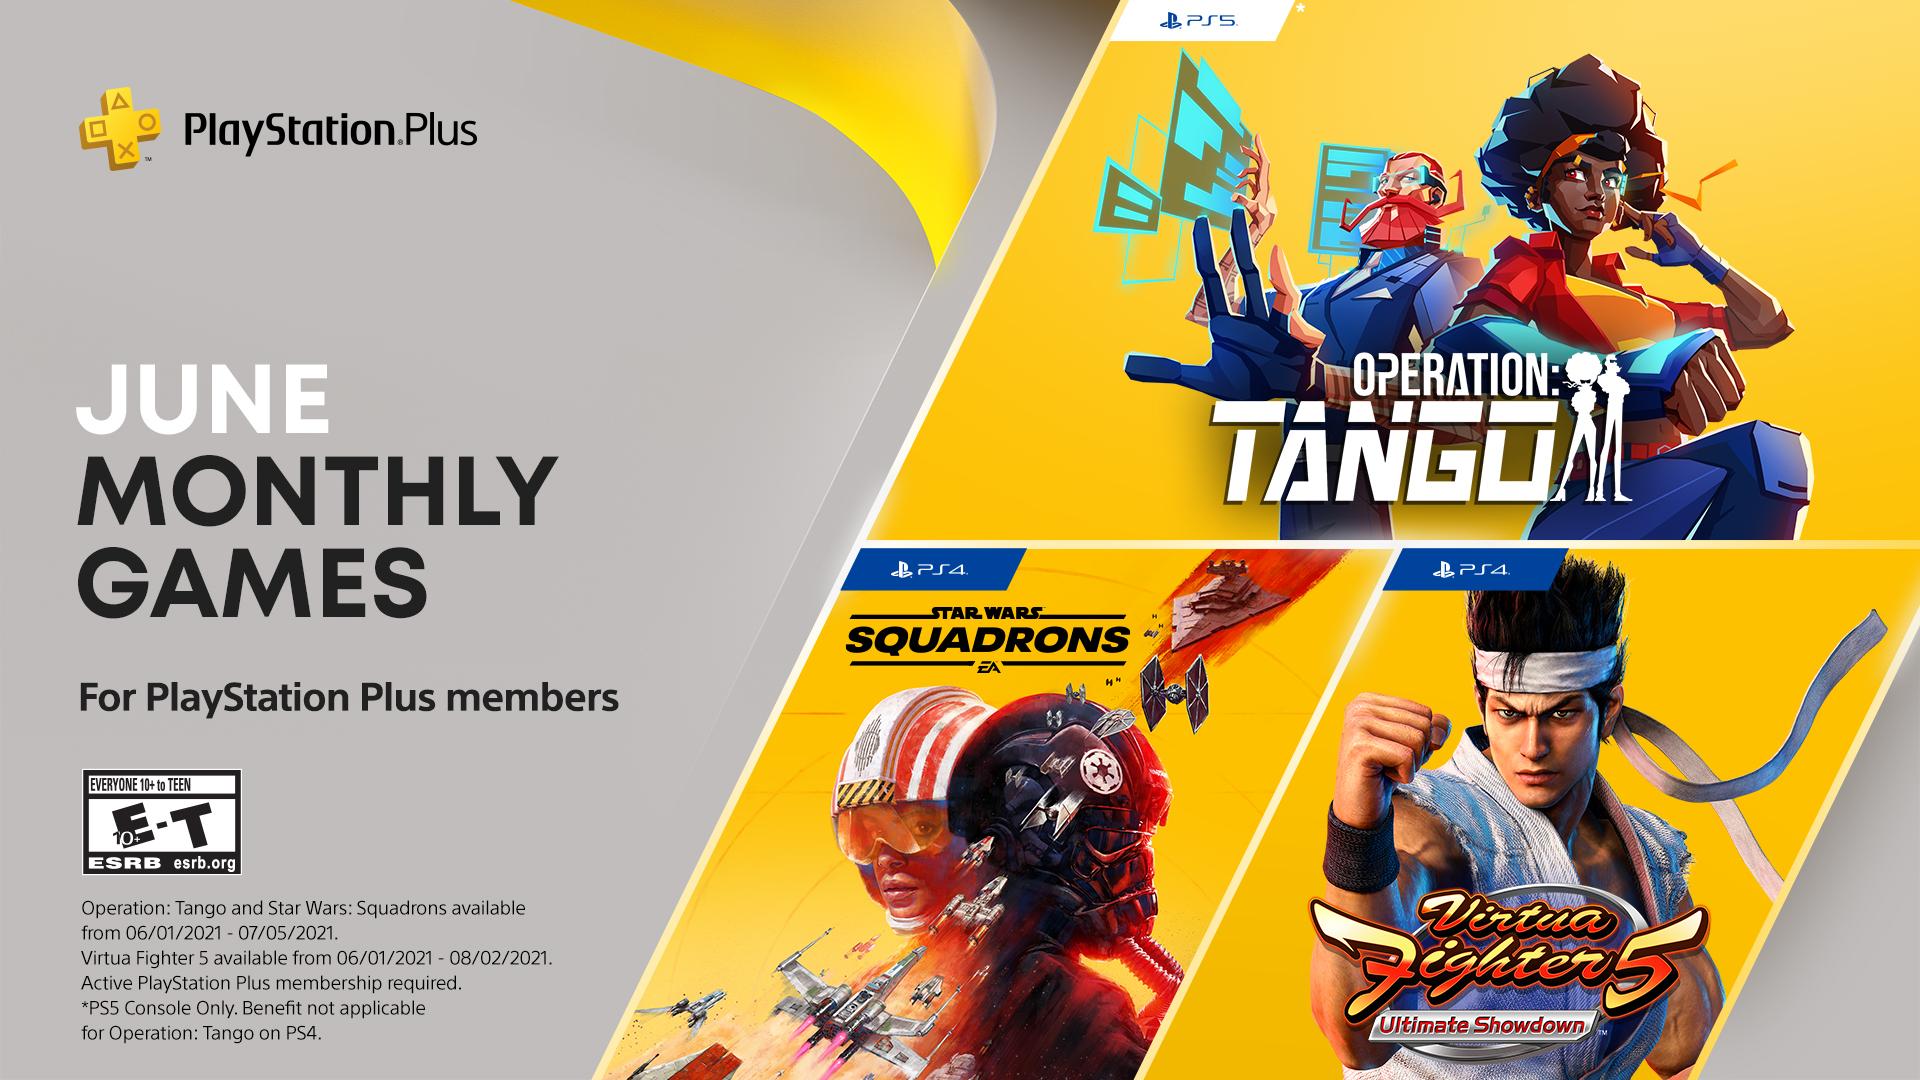 PSN PLUS junio (Virtua Fighter 5: Ultimate Showdown, Star Wars: Squadrons y Operation: Tango)